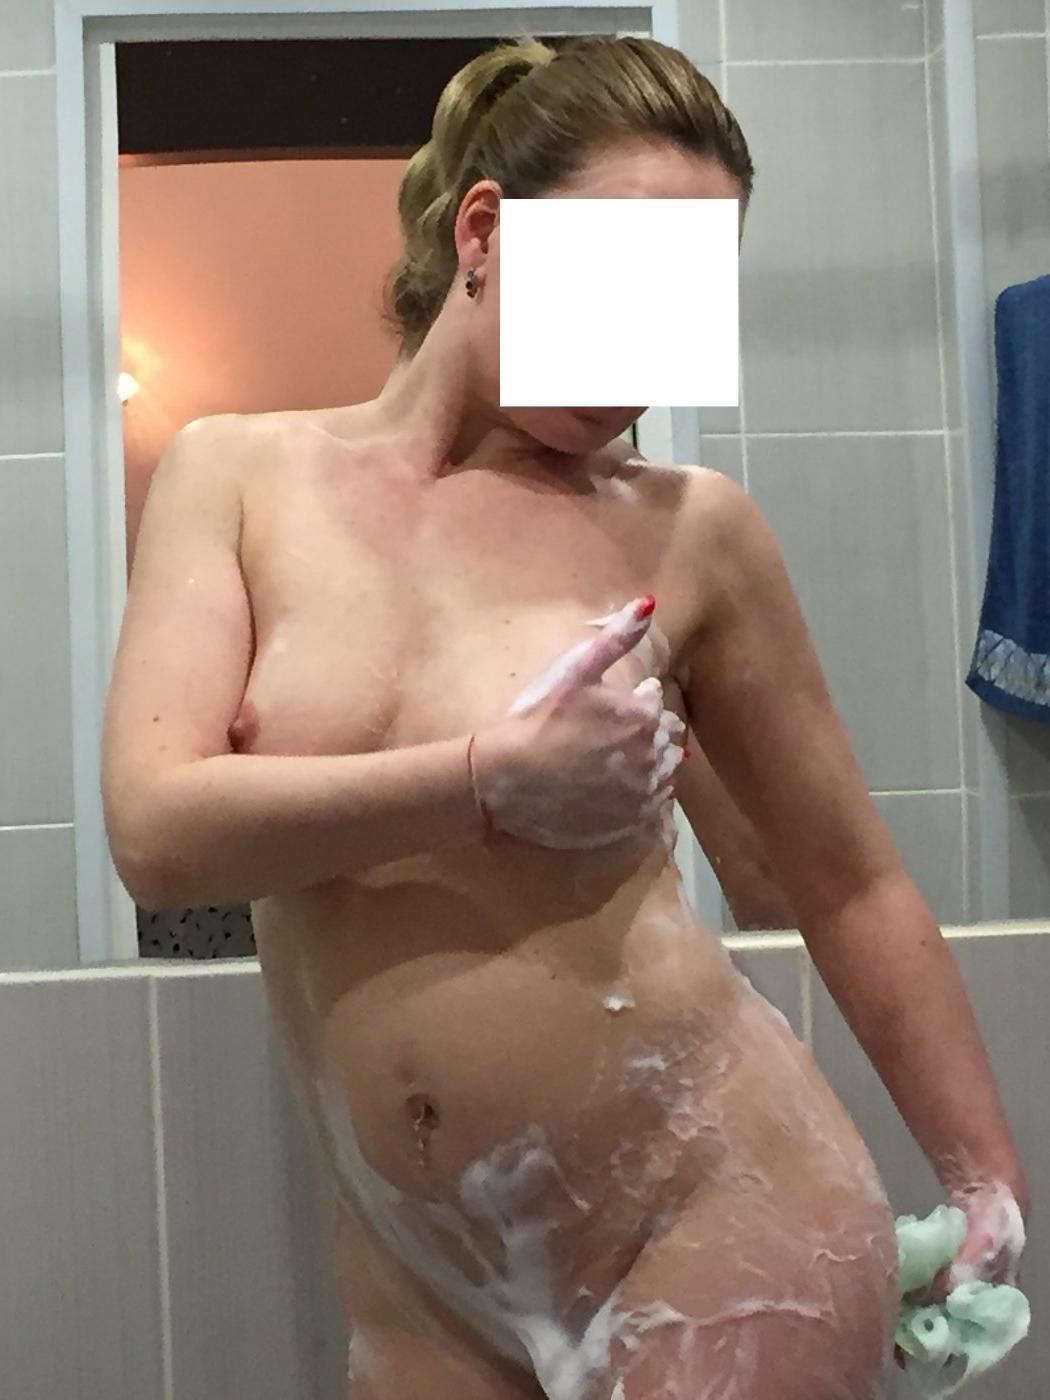 Путана Надин, 23 года, метро Тропарёво